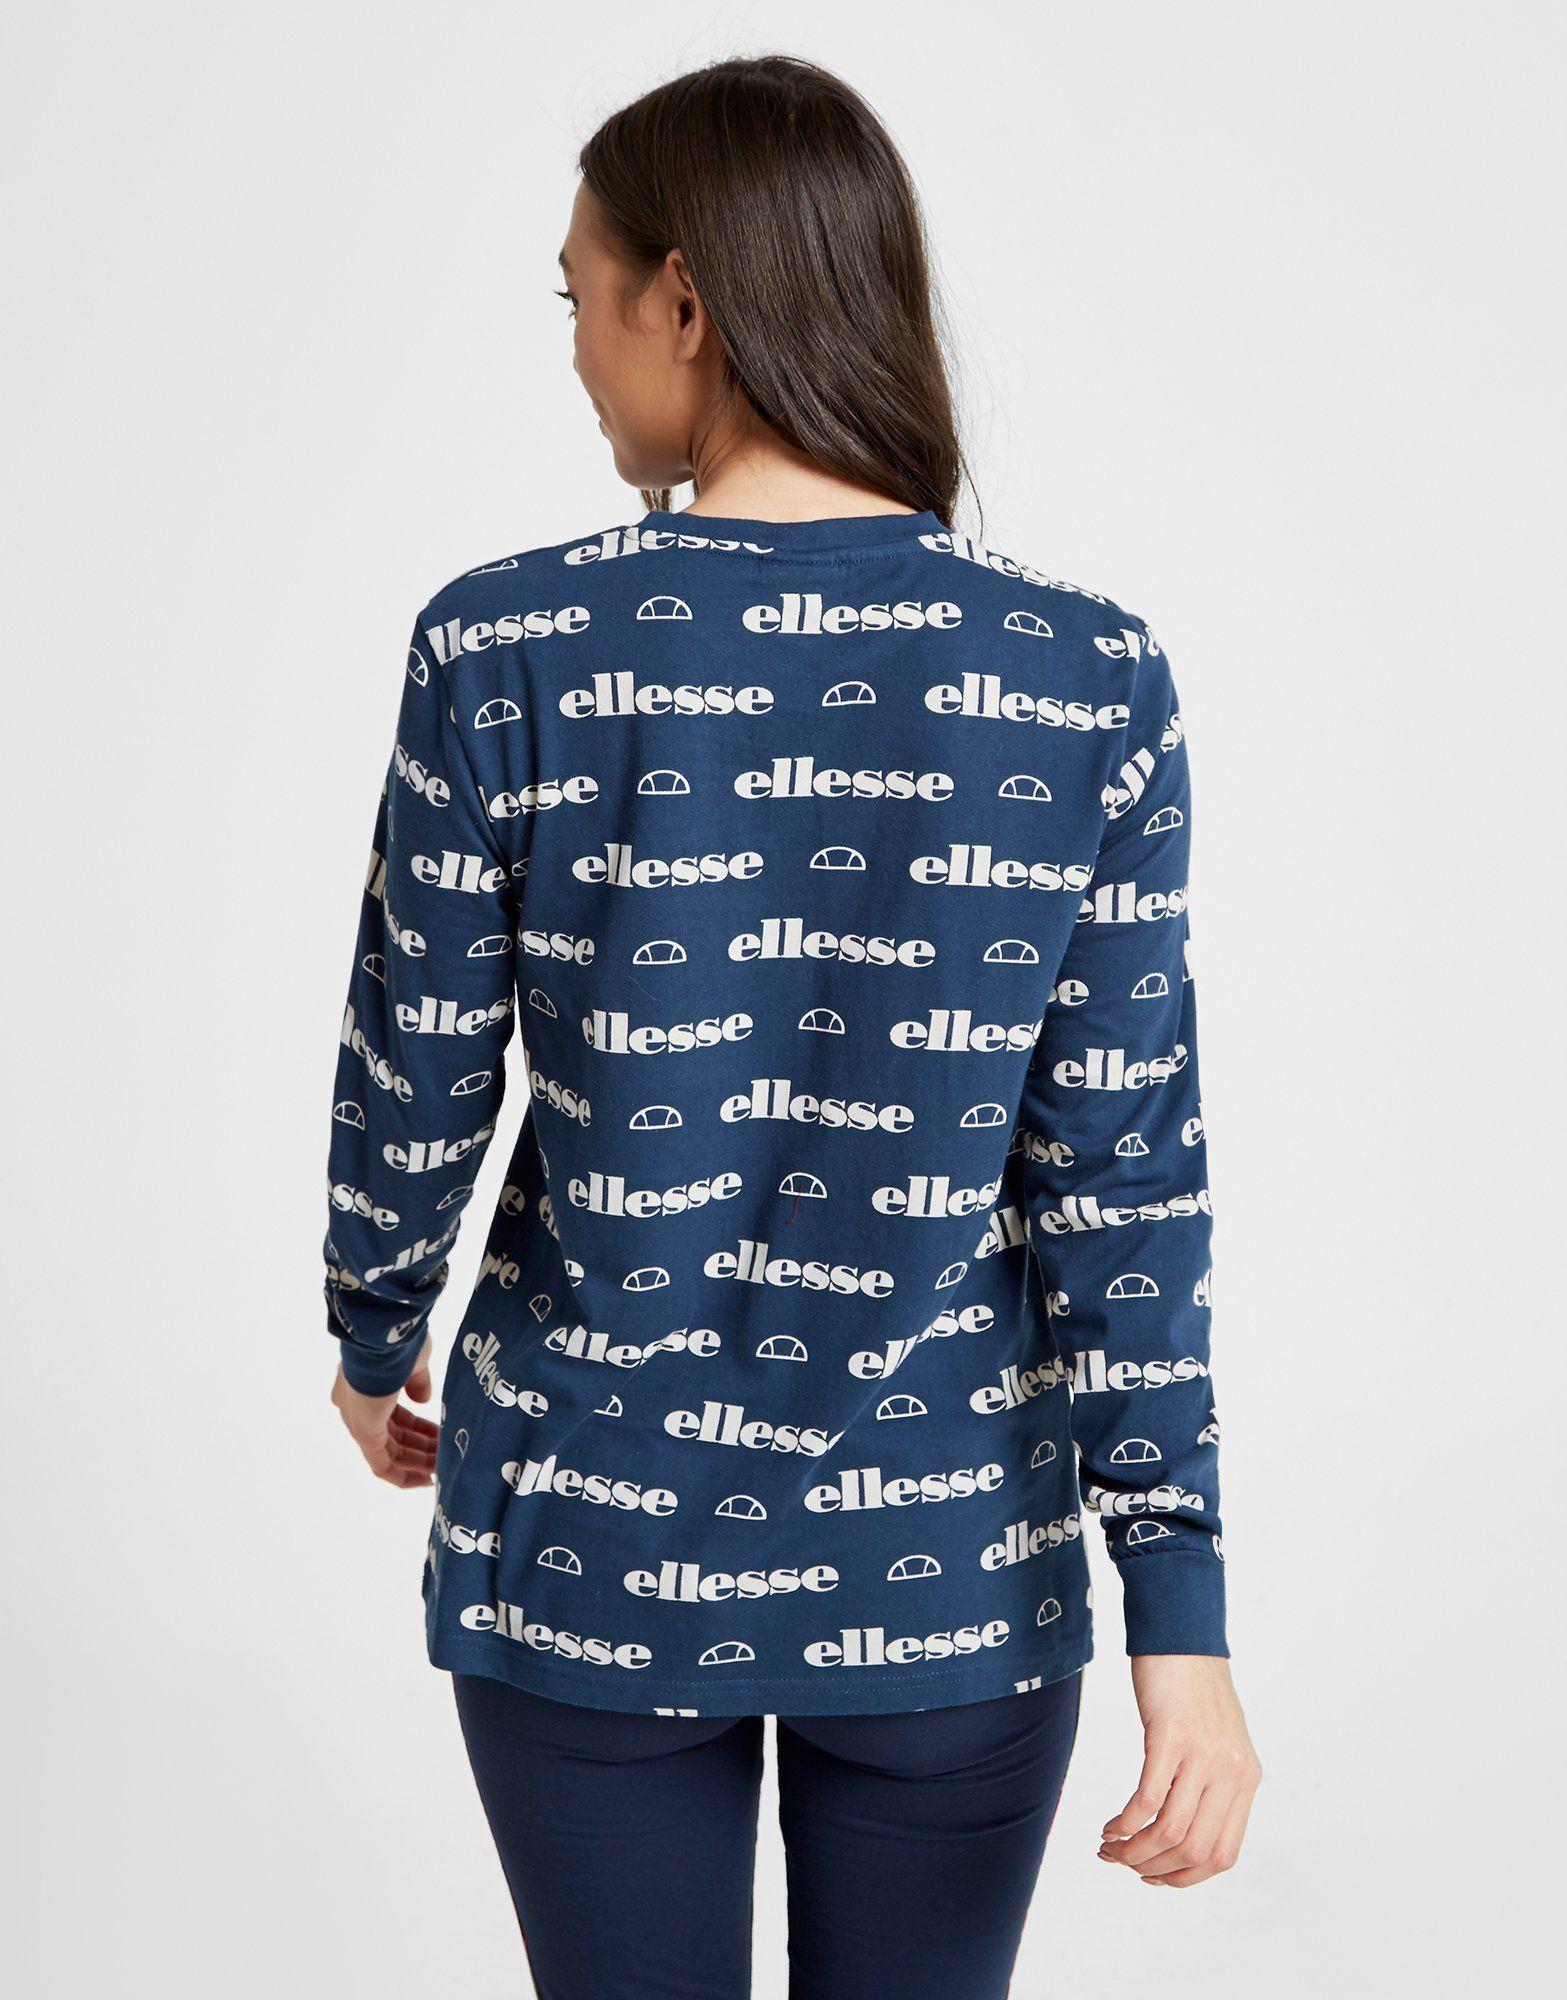 Ellesse T-shirt Boyfriend Anne-Marie All Over Print Femme